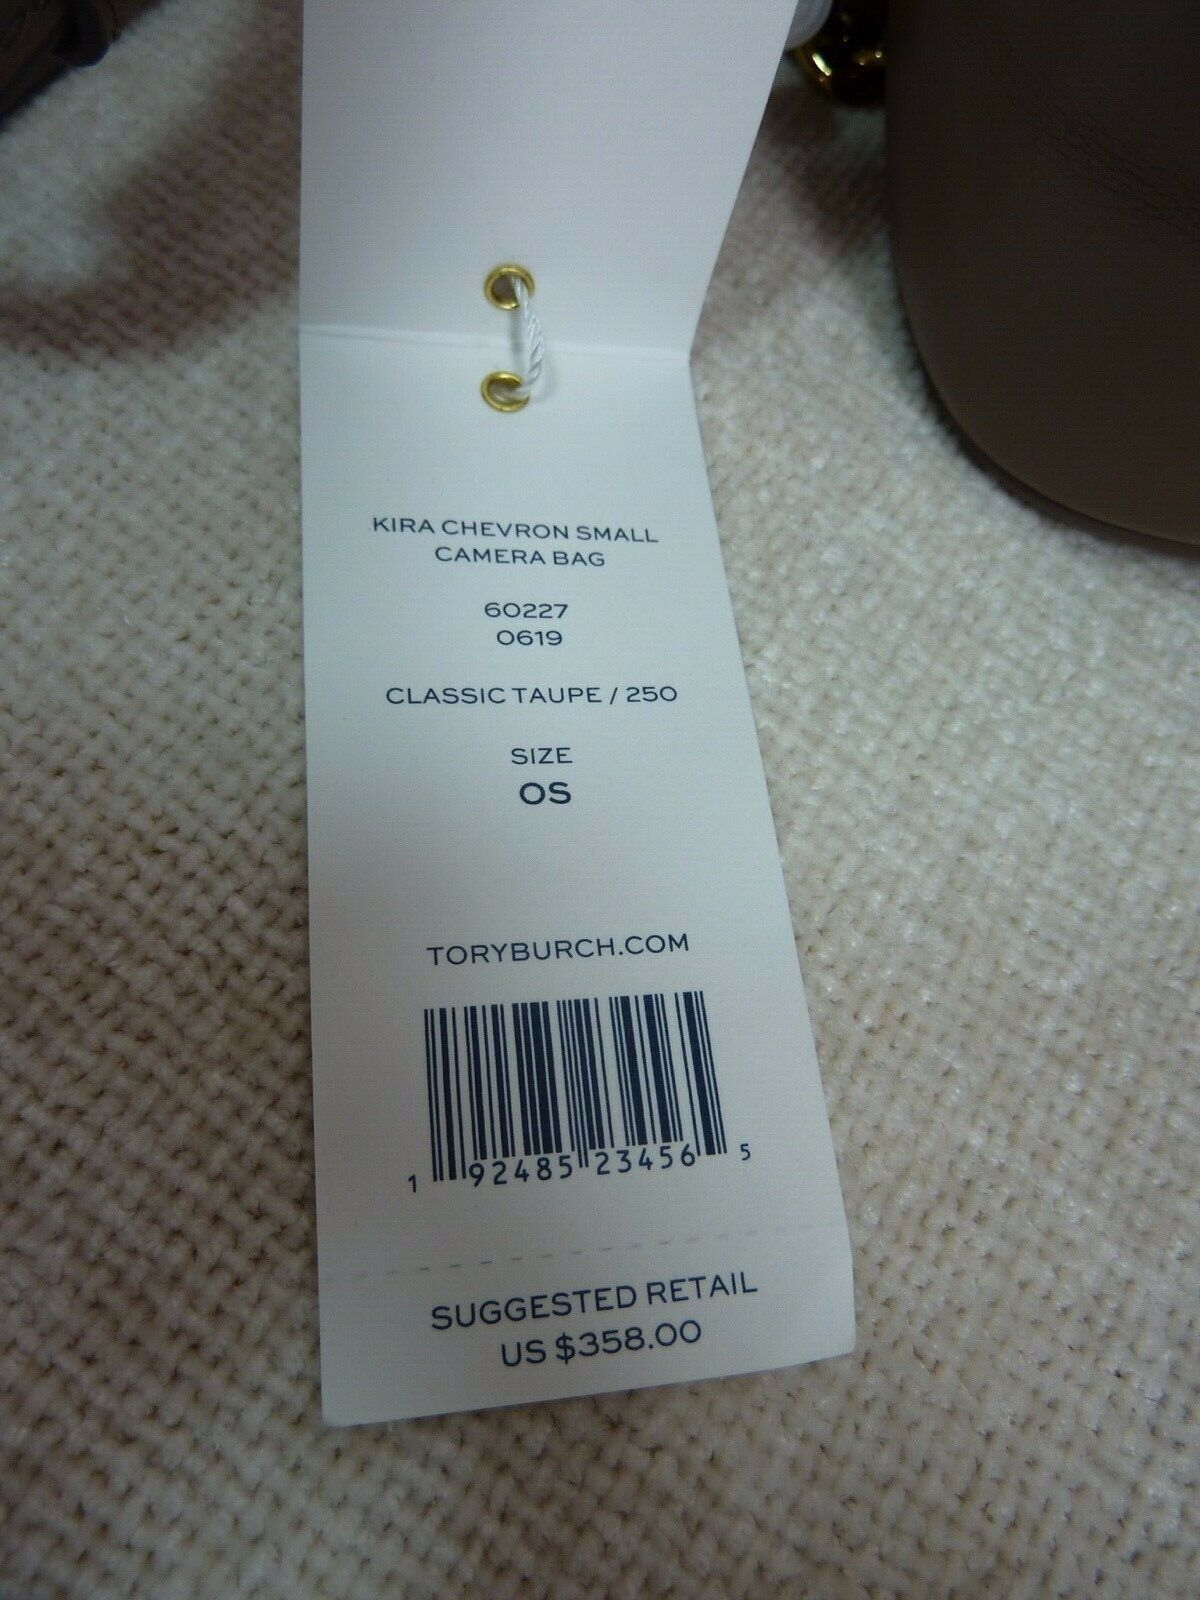 NWT Tory Burch Classic Taupe Kira Chevron Small Camera Bag $358 image 10